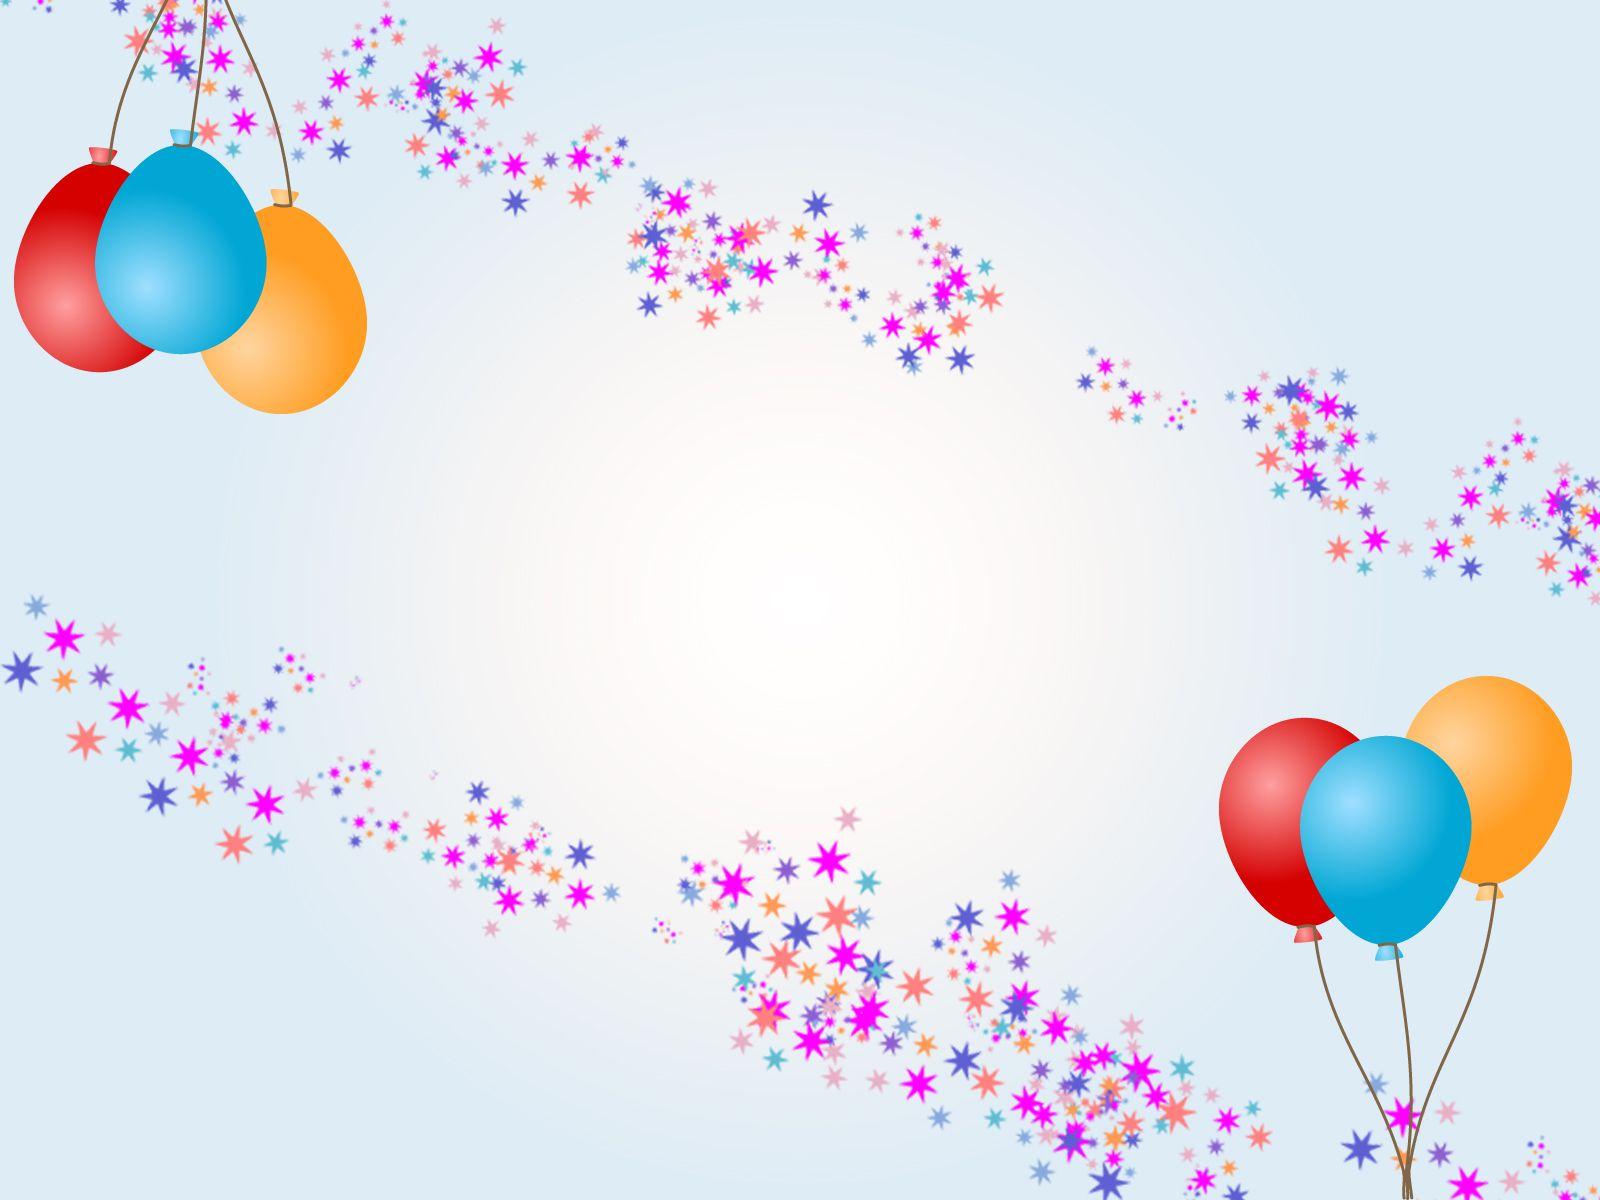 Next stop Pinterest Birthday card template free